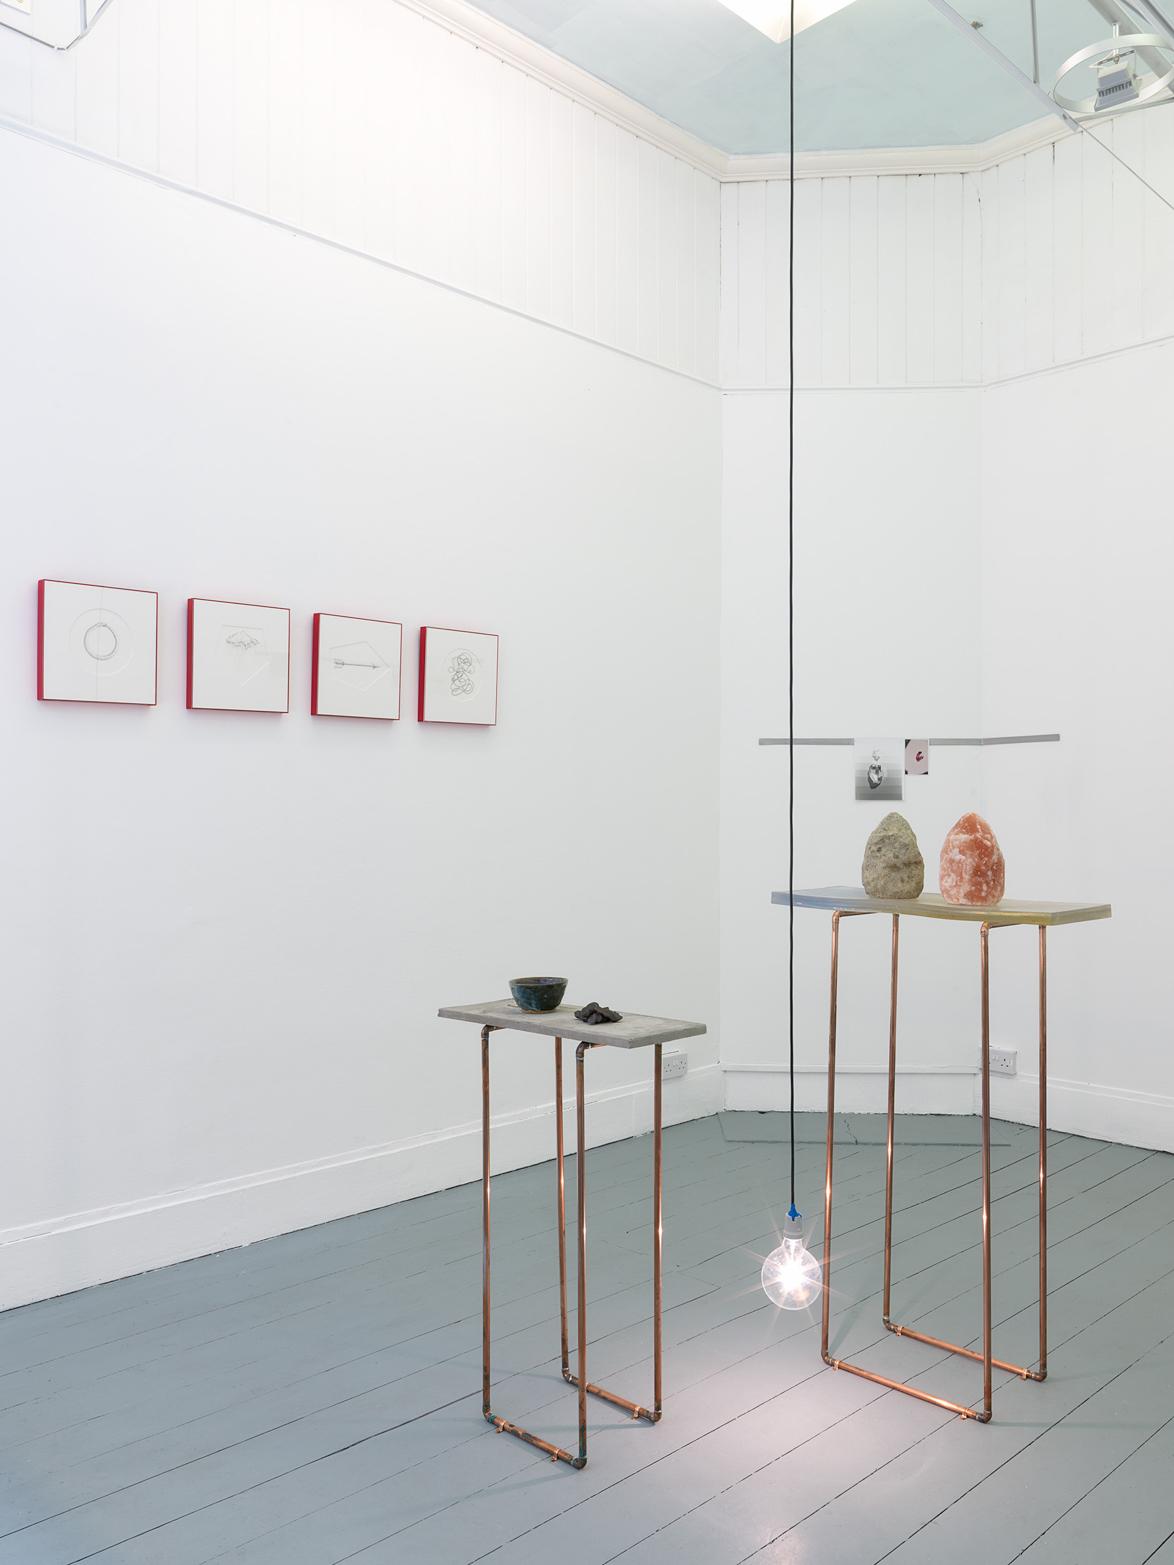 Kentaro Yamada, Cathy Haynes, Fay Nicolson. Tenderpixel Gallery.